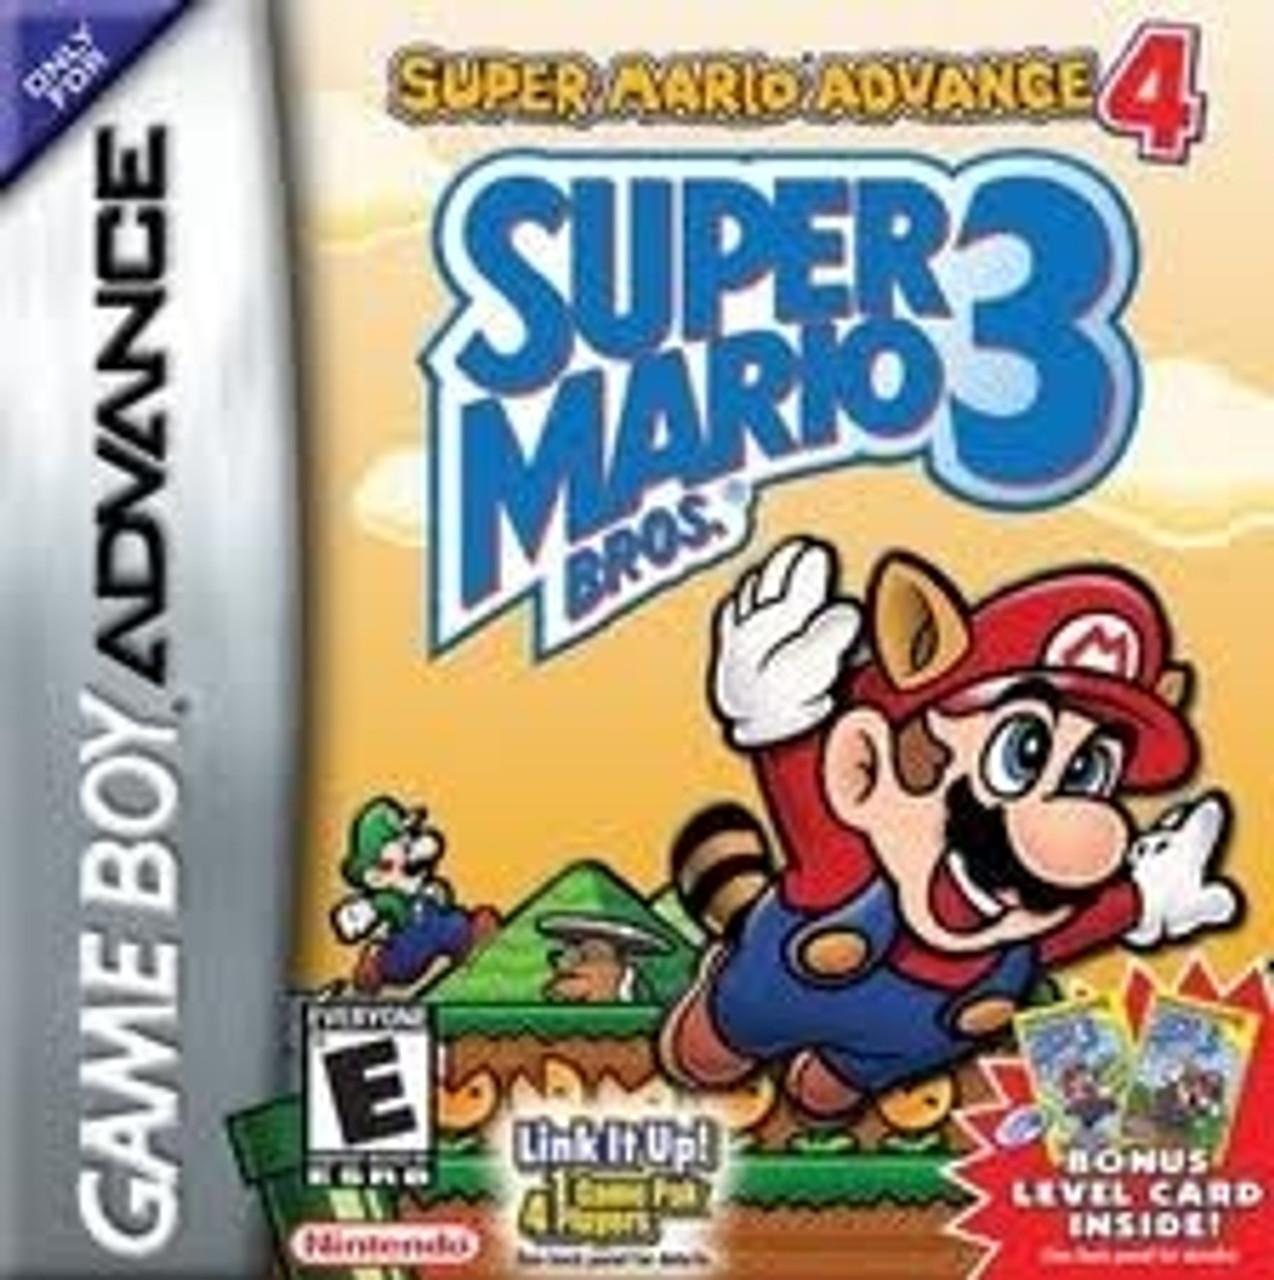 Super Mario Advance 4 Super Mario Bros 3 Gameboy Game Advance